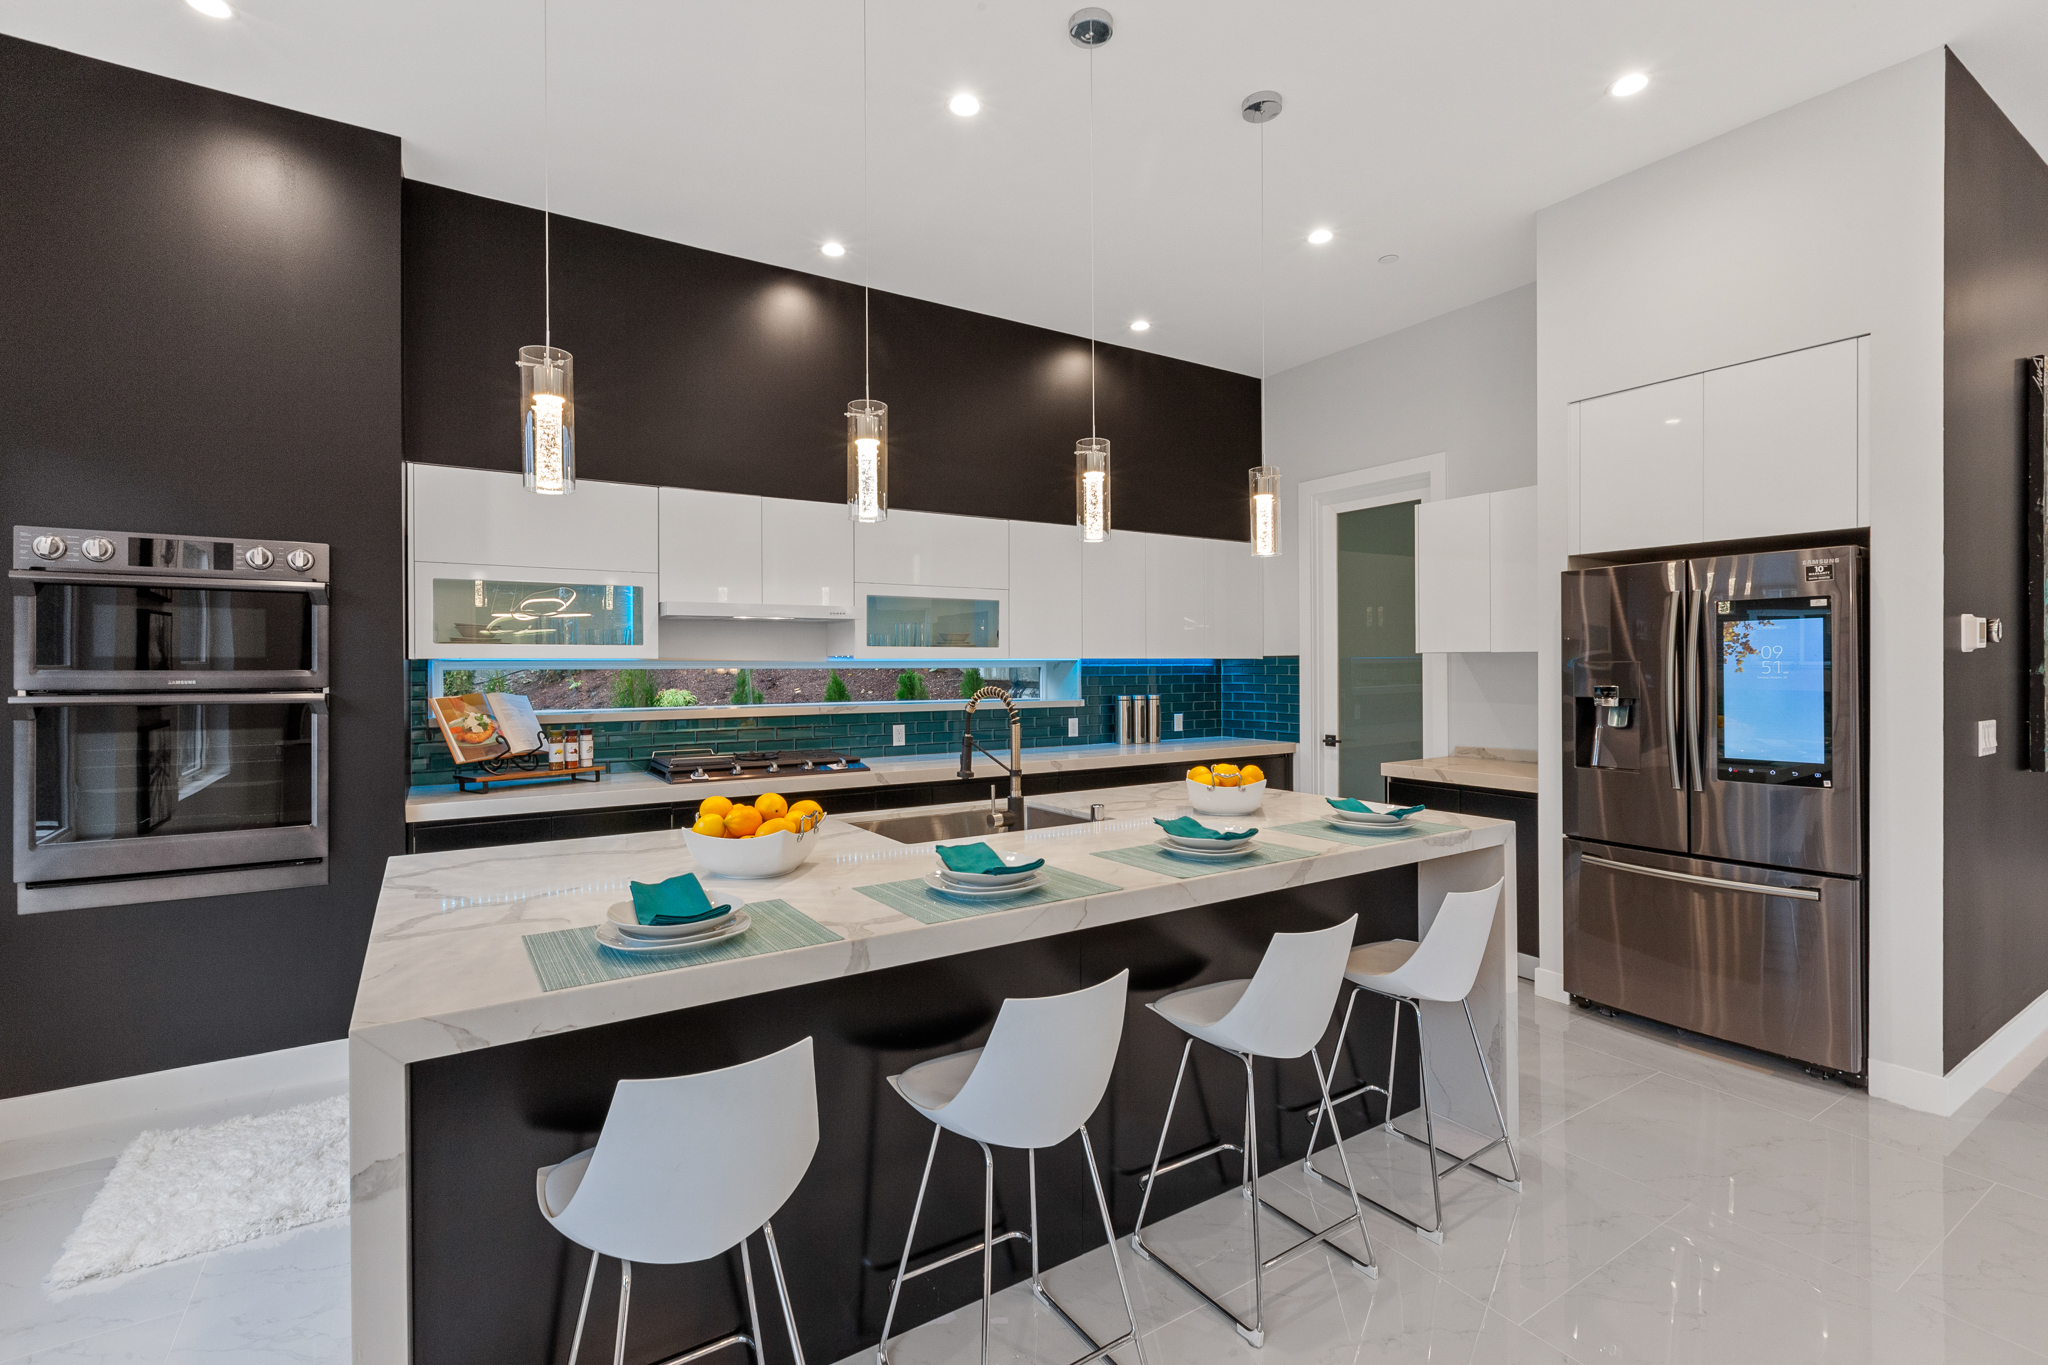 Kitchen - Luxury Real Estate - 18109 84th Ave W, Edmonds